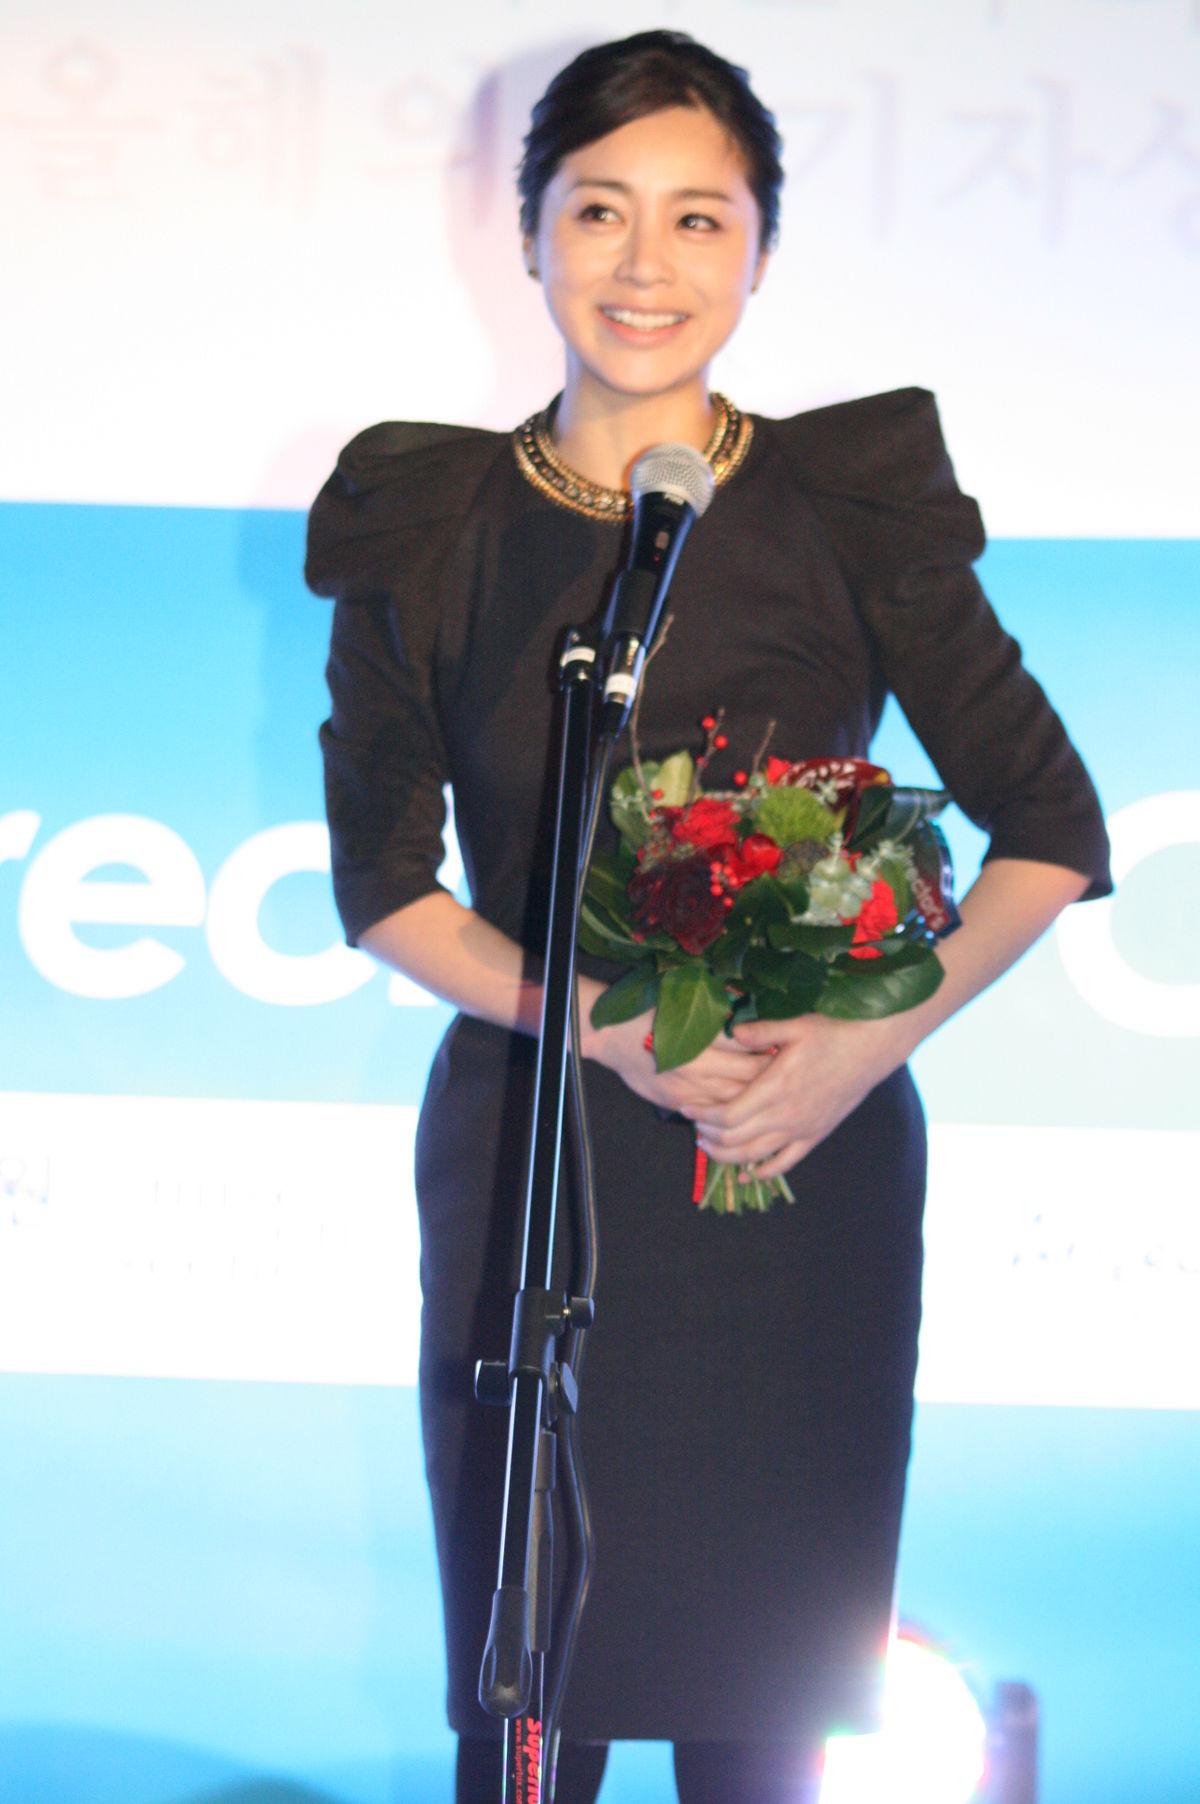 Seo Young-hee - Wikipedia